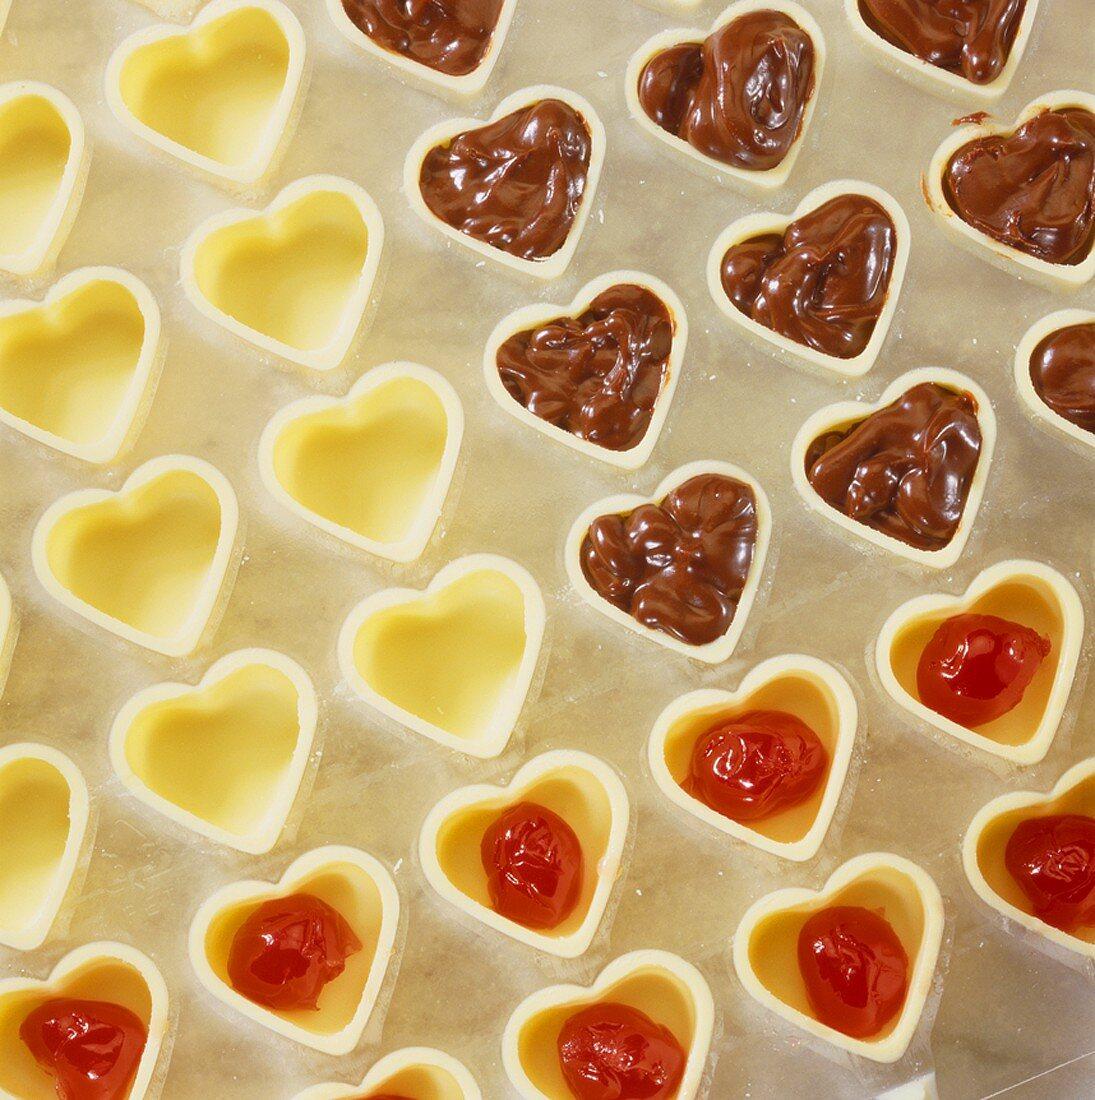 Making chocolates: making cherry truffle hearts